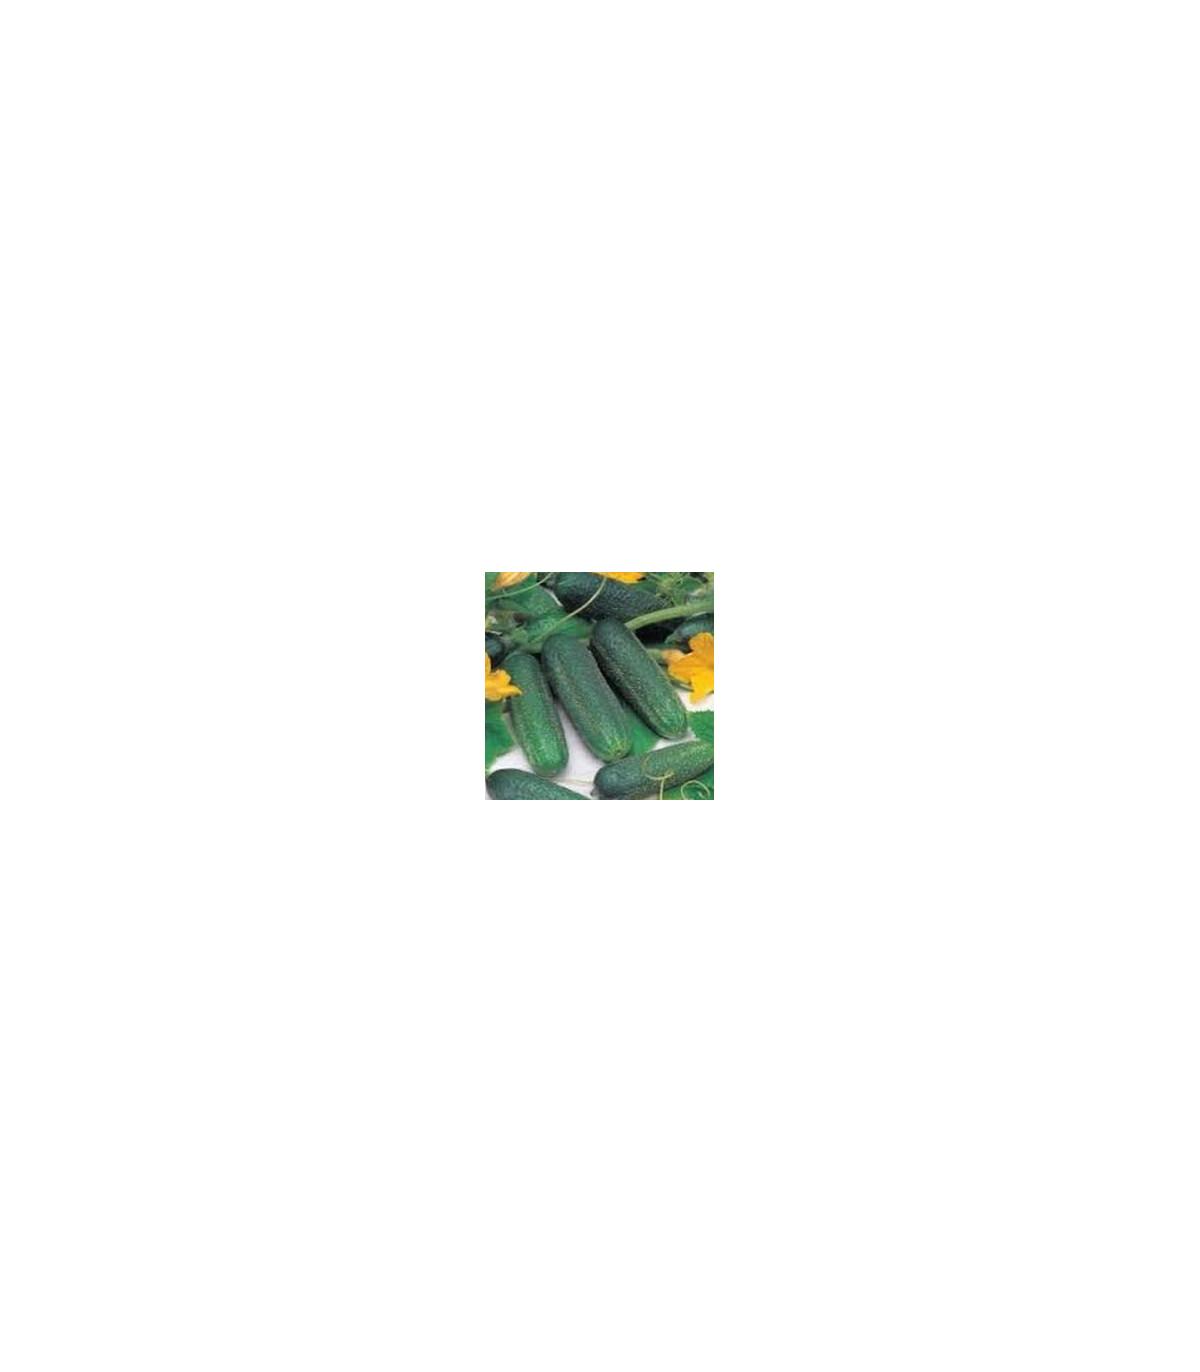 BIO uhorka nakladačka F1 Diamant - Cucumis sativus - 8 ks